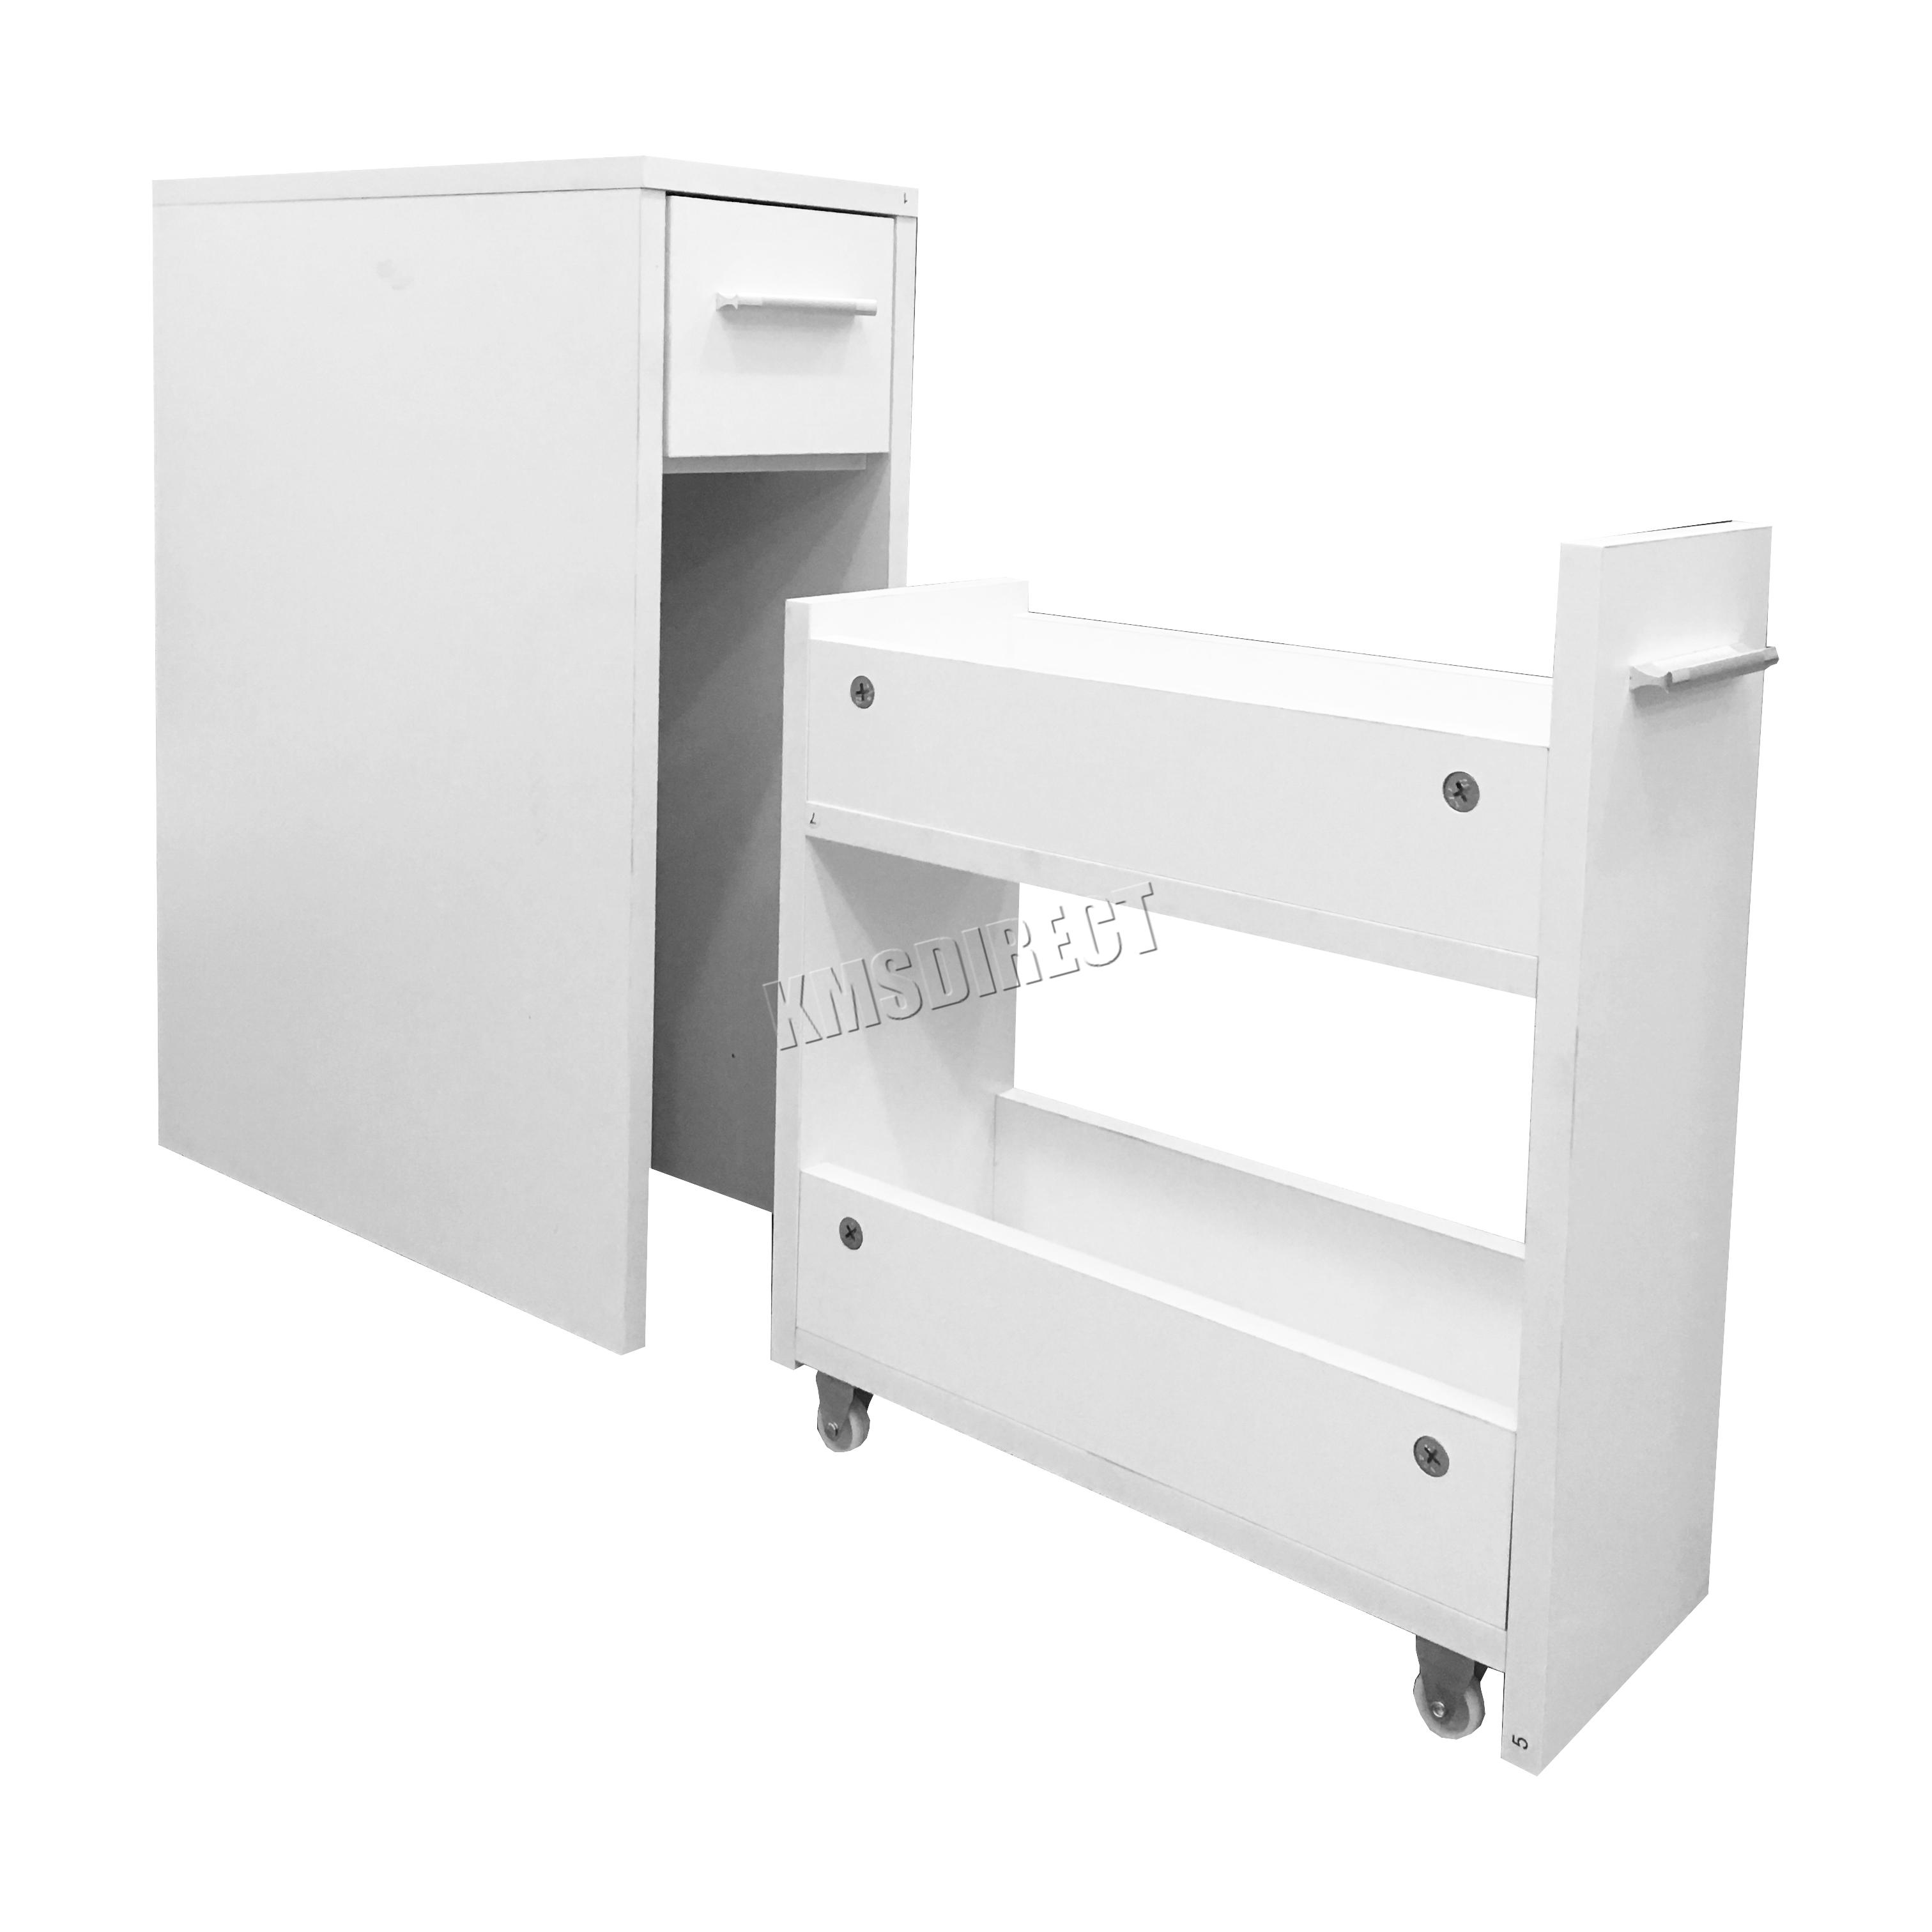 WestWood Slimline Bathroom Slide Out Storage Drawer Cabinet Cupboard ...